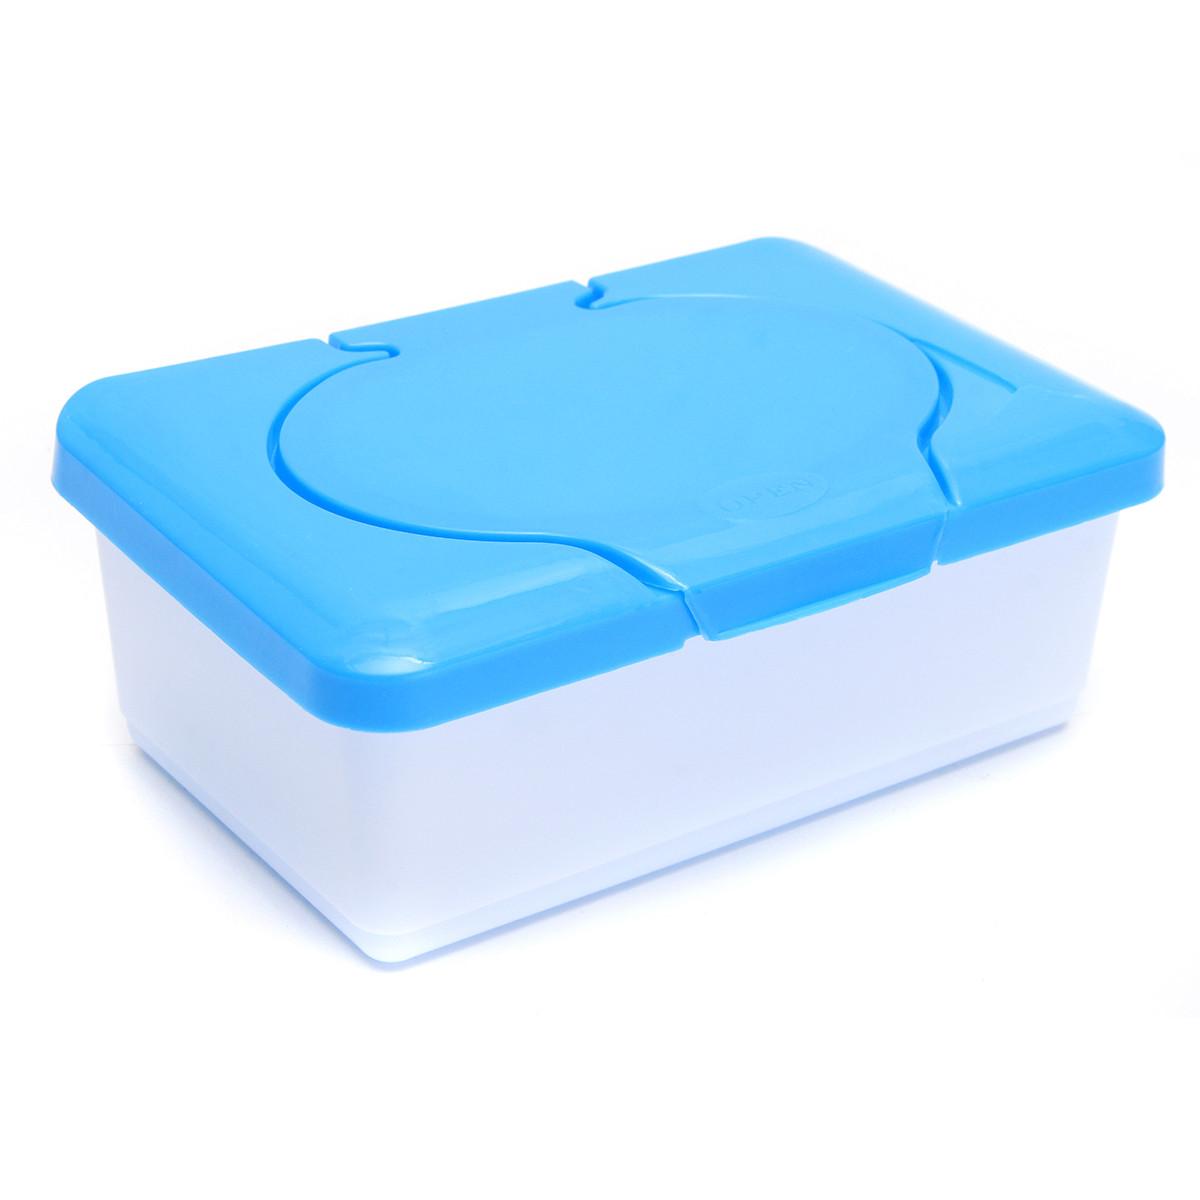 Wet Tissue Box Plastic Case Real Tissue Case Baby Wipes Press Pop-up Design Home Tissue Holder Accessories